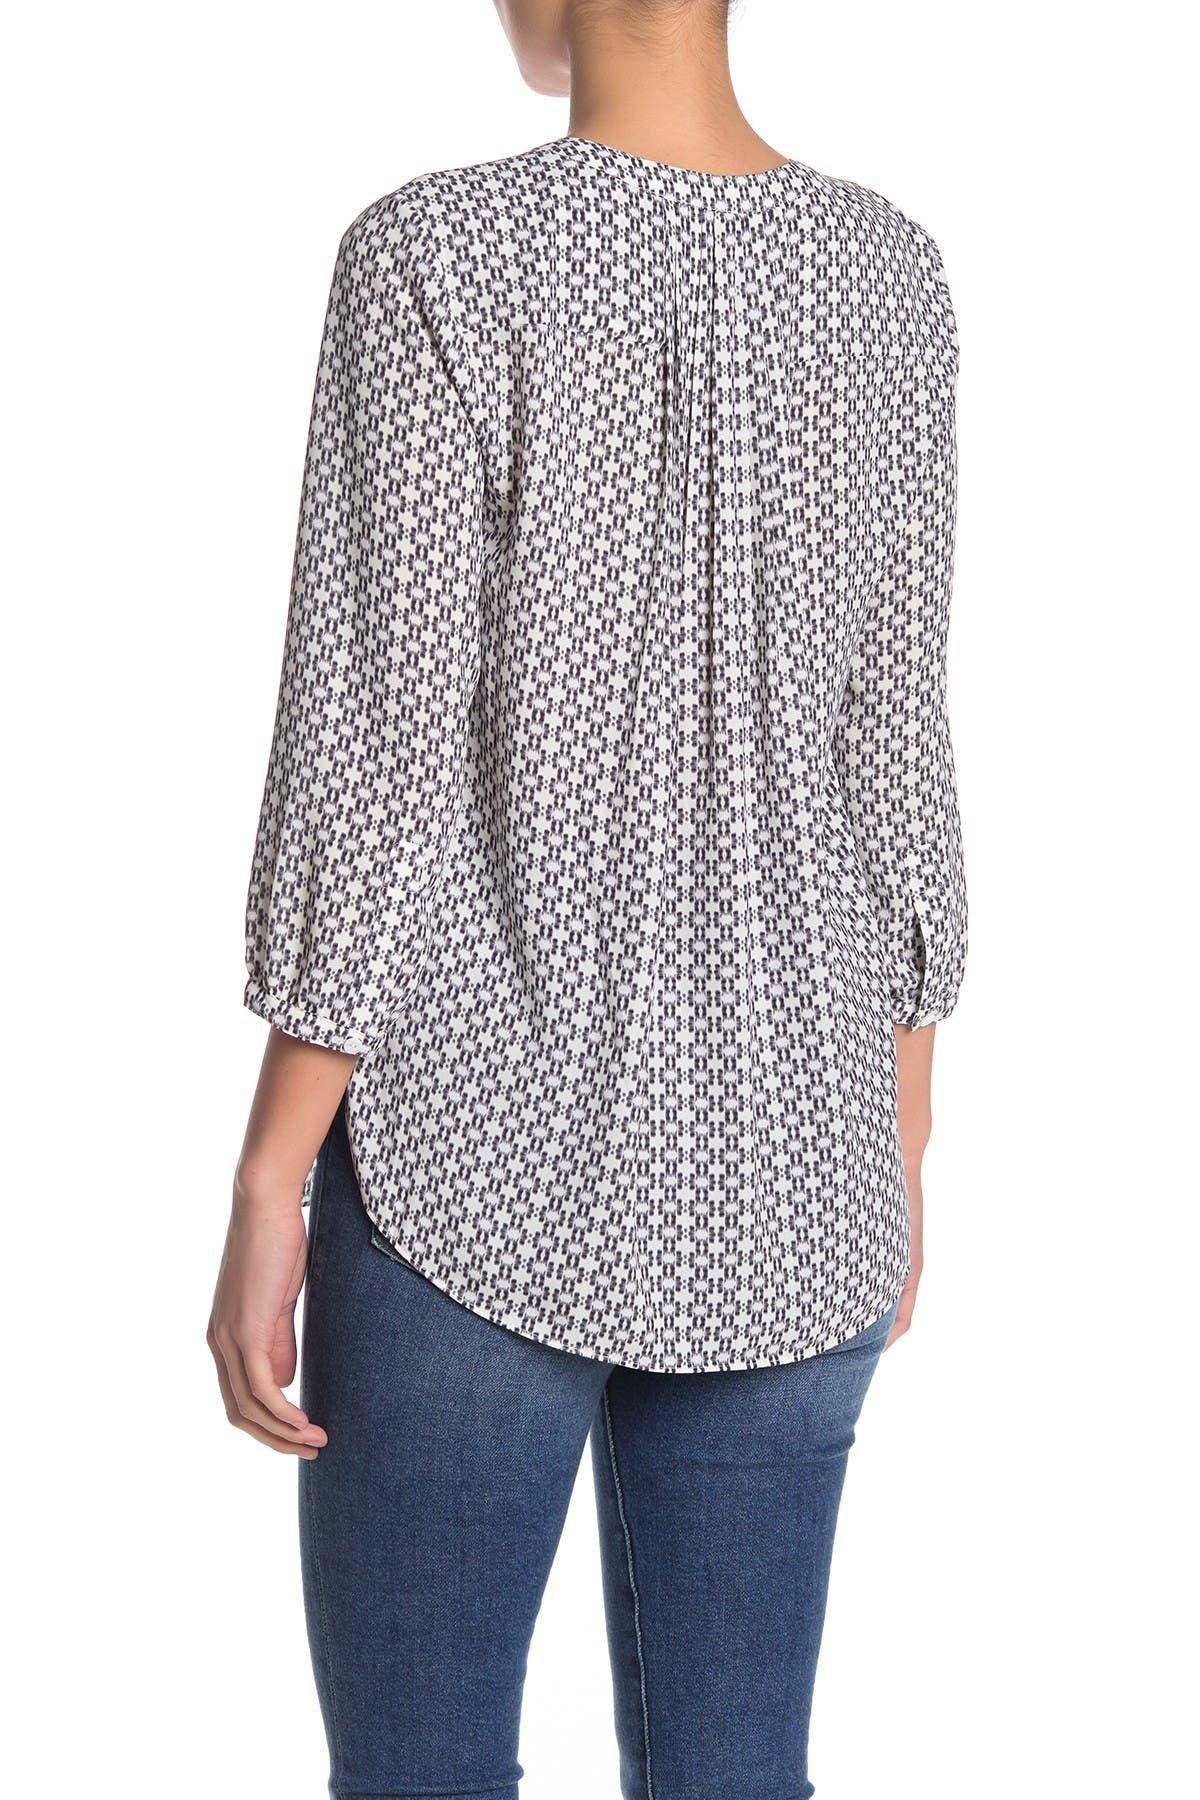 NYDJ Womens Petite Size 3//4 Sleeve Pintuck Blouse